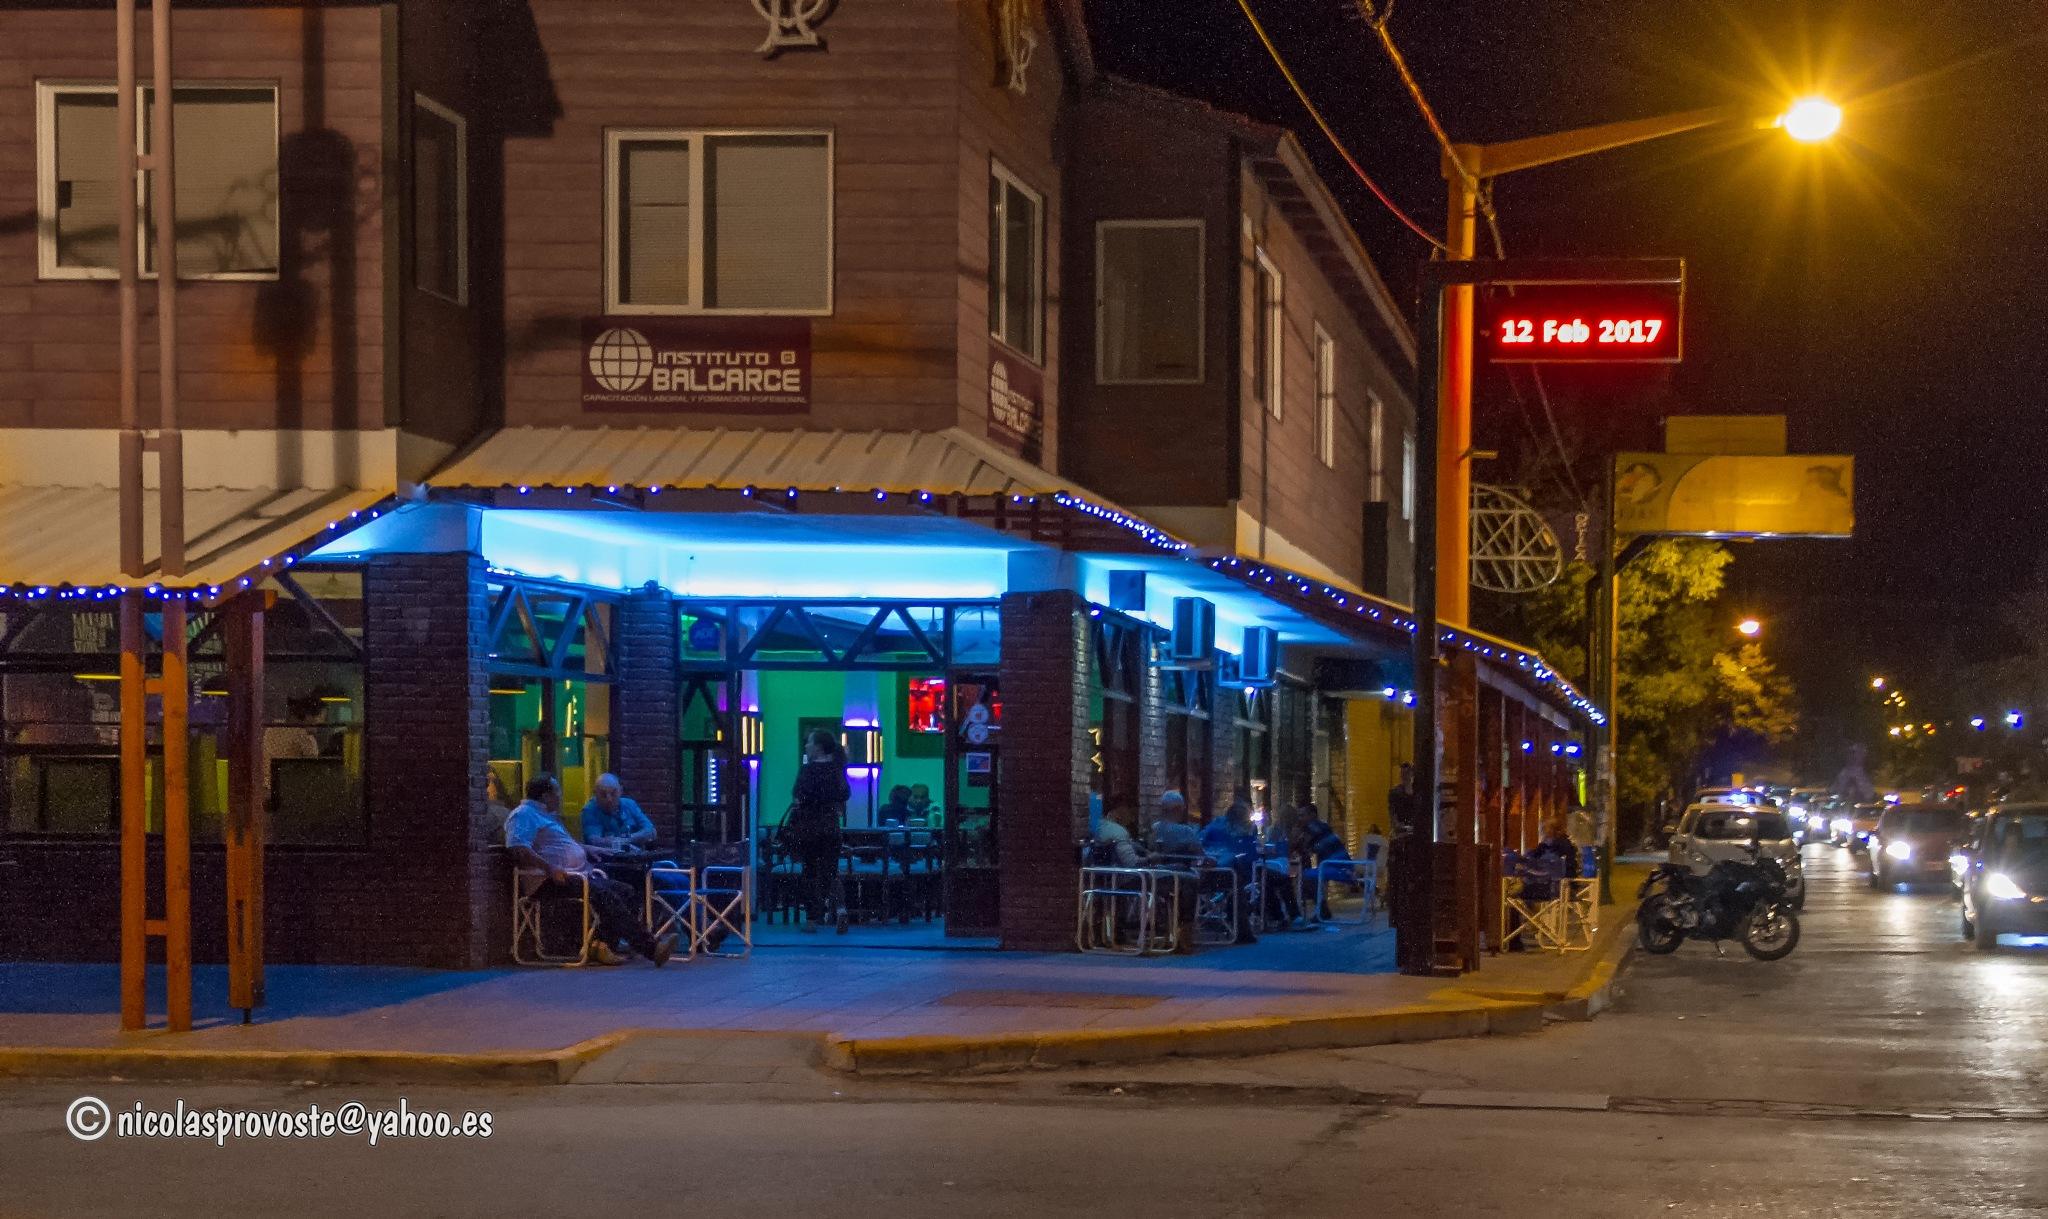 Restaurante de Zapala by nicolasprovoste